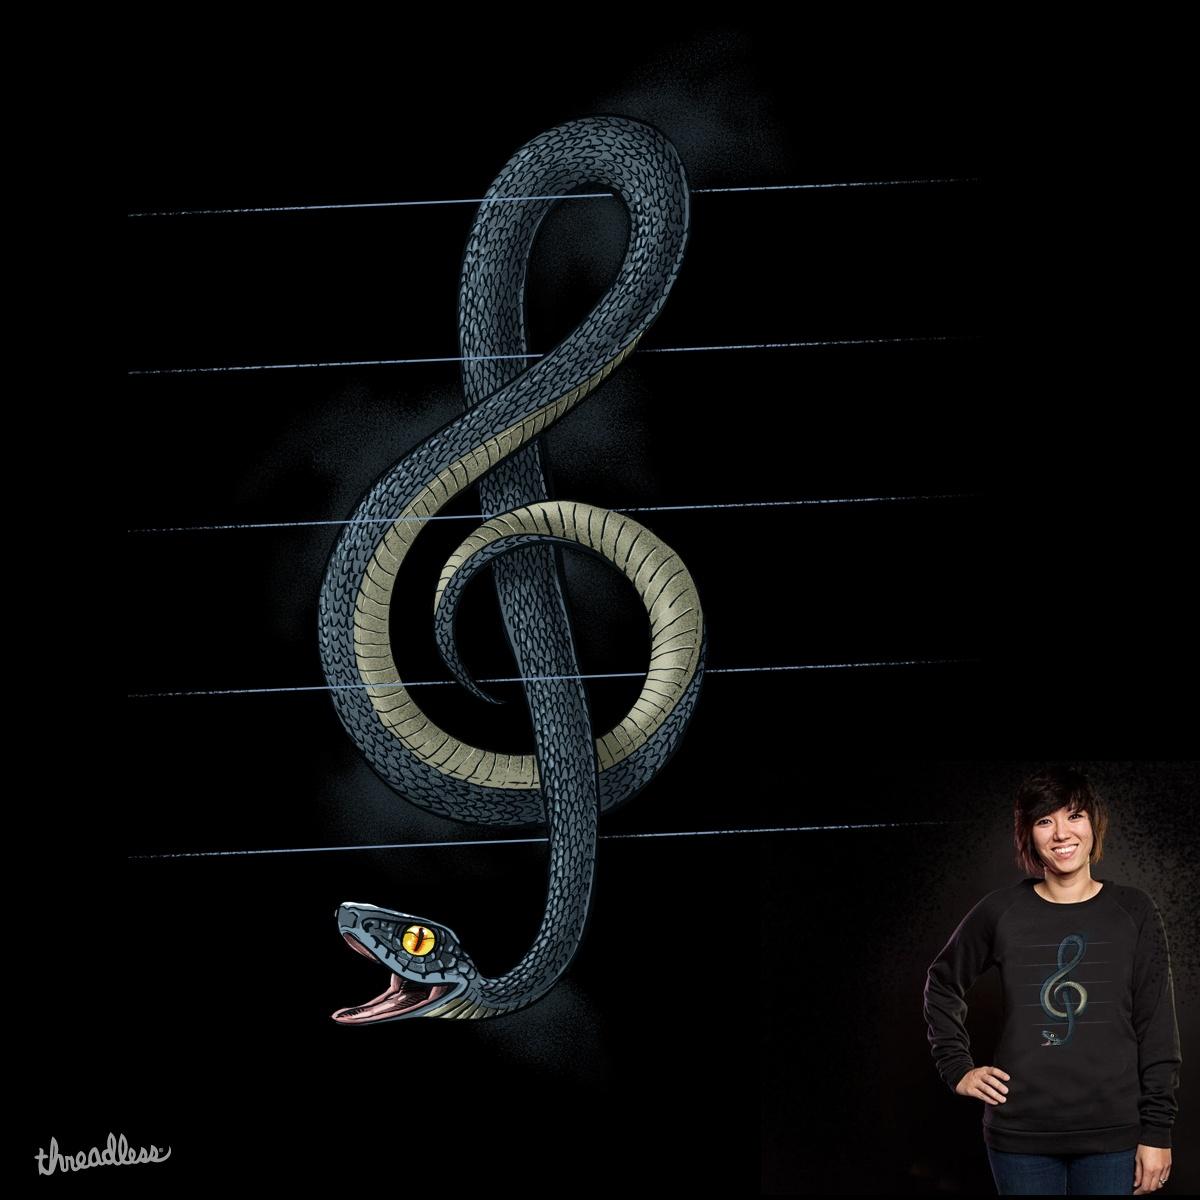 Snake Note by Oktomanuba on Threadless